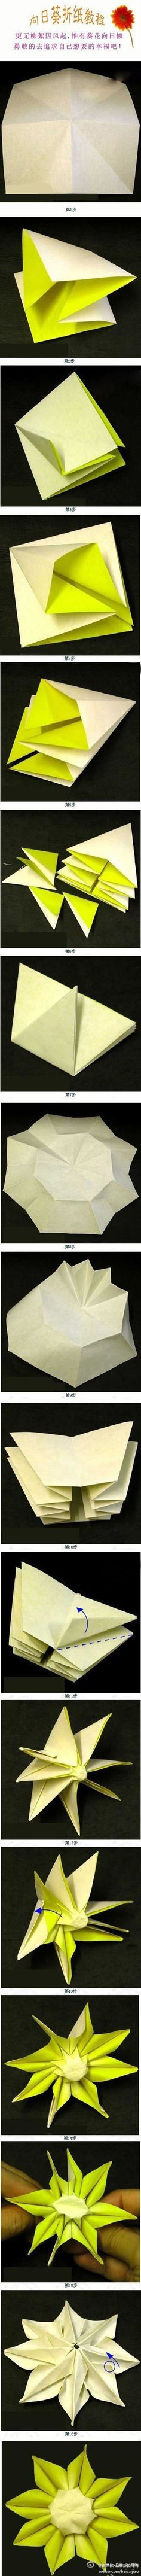 88 Best Origami Images Diagrams Paper Folding Halloween Diagram Flower Art Crafts Diy Flowers